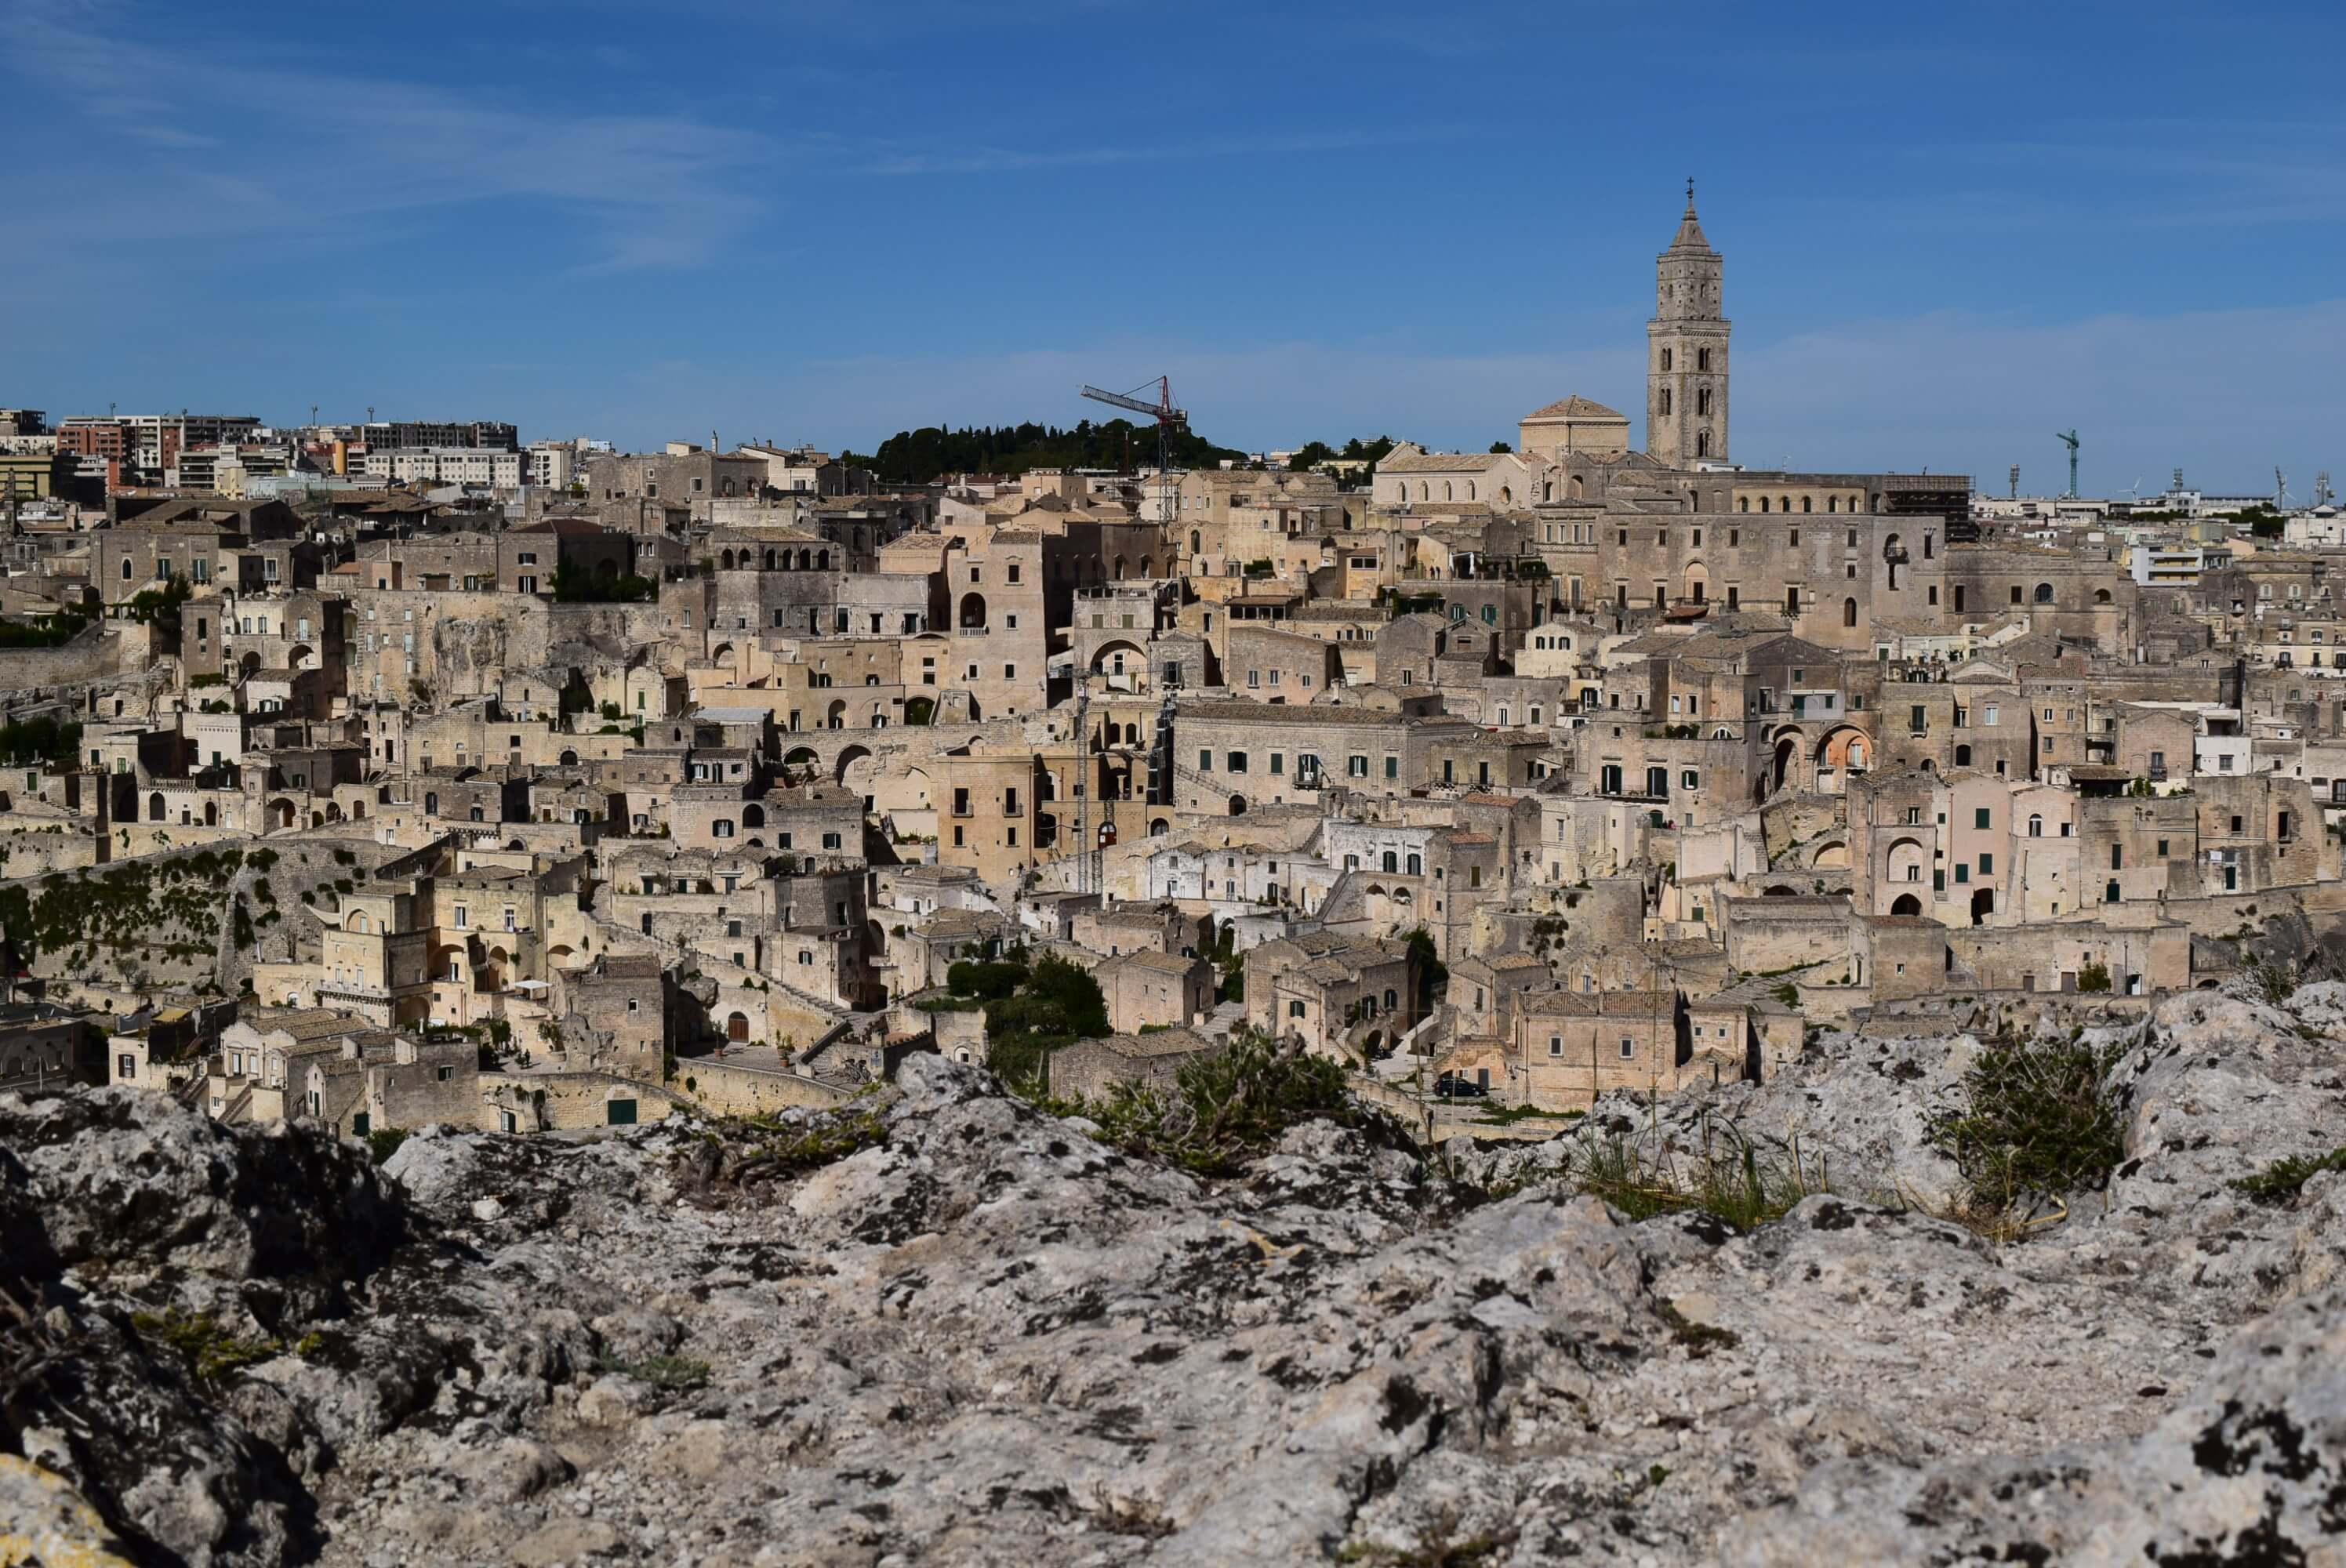 Vista de Matera, Basilicata